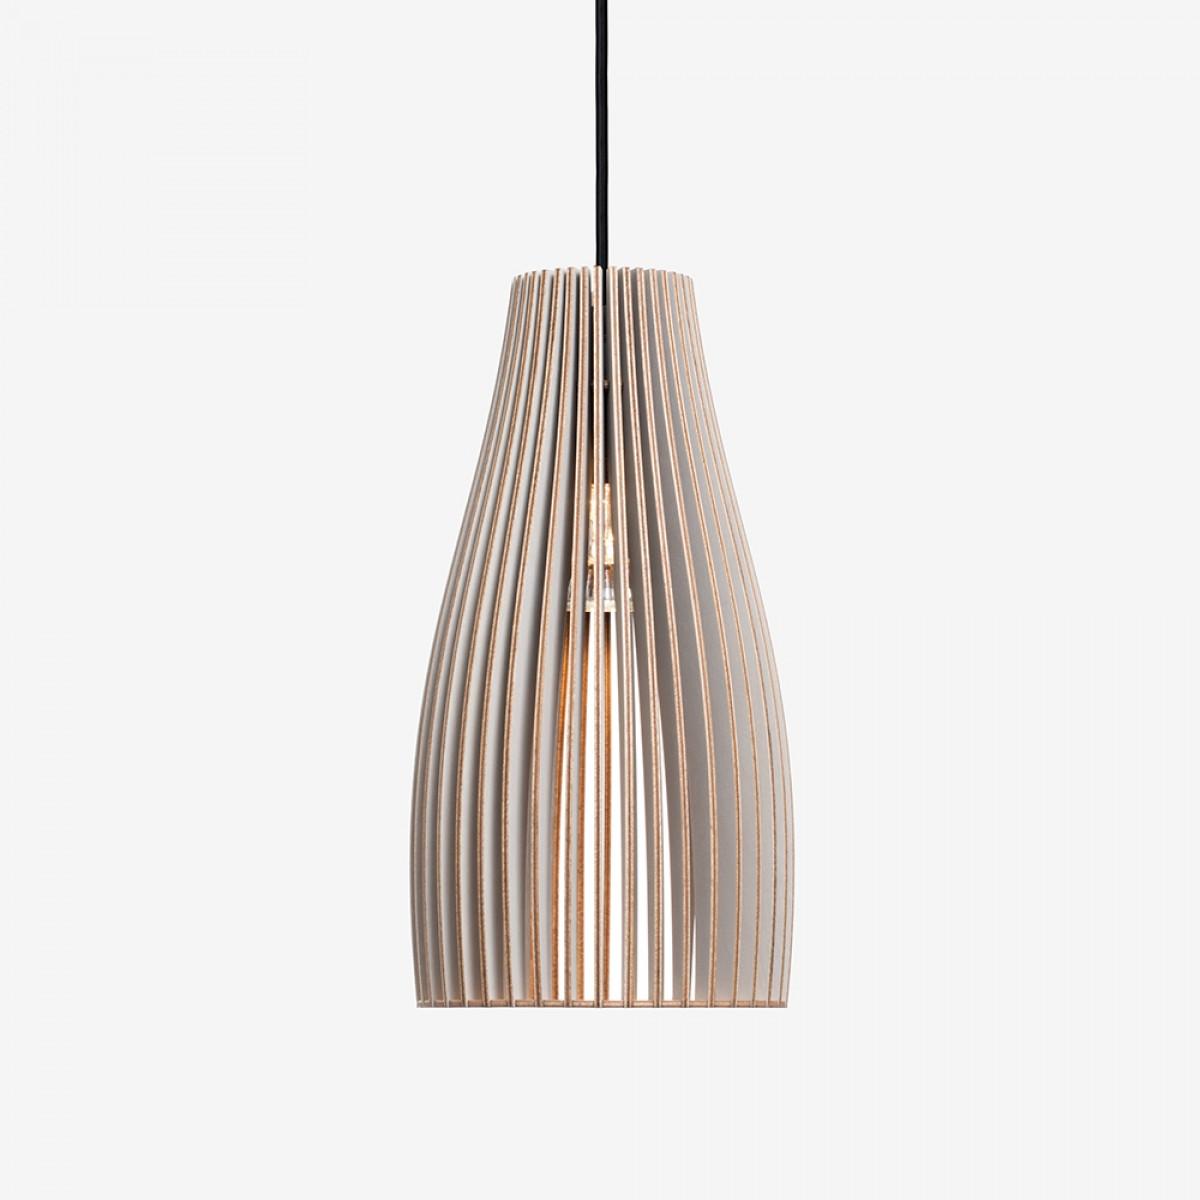 ENA Pendelleuchte aus Holz (grau)